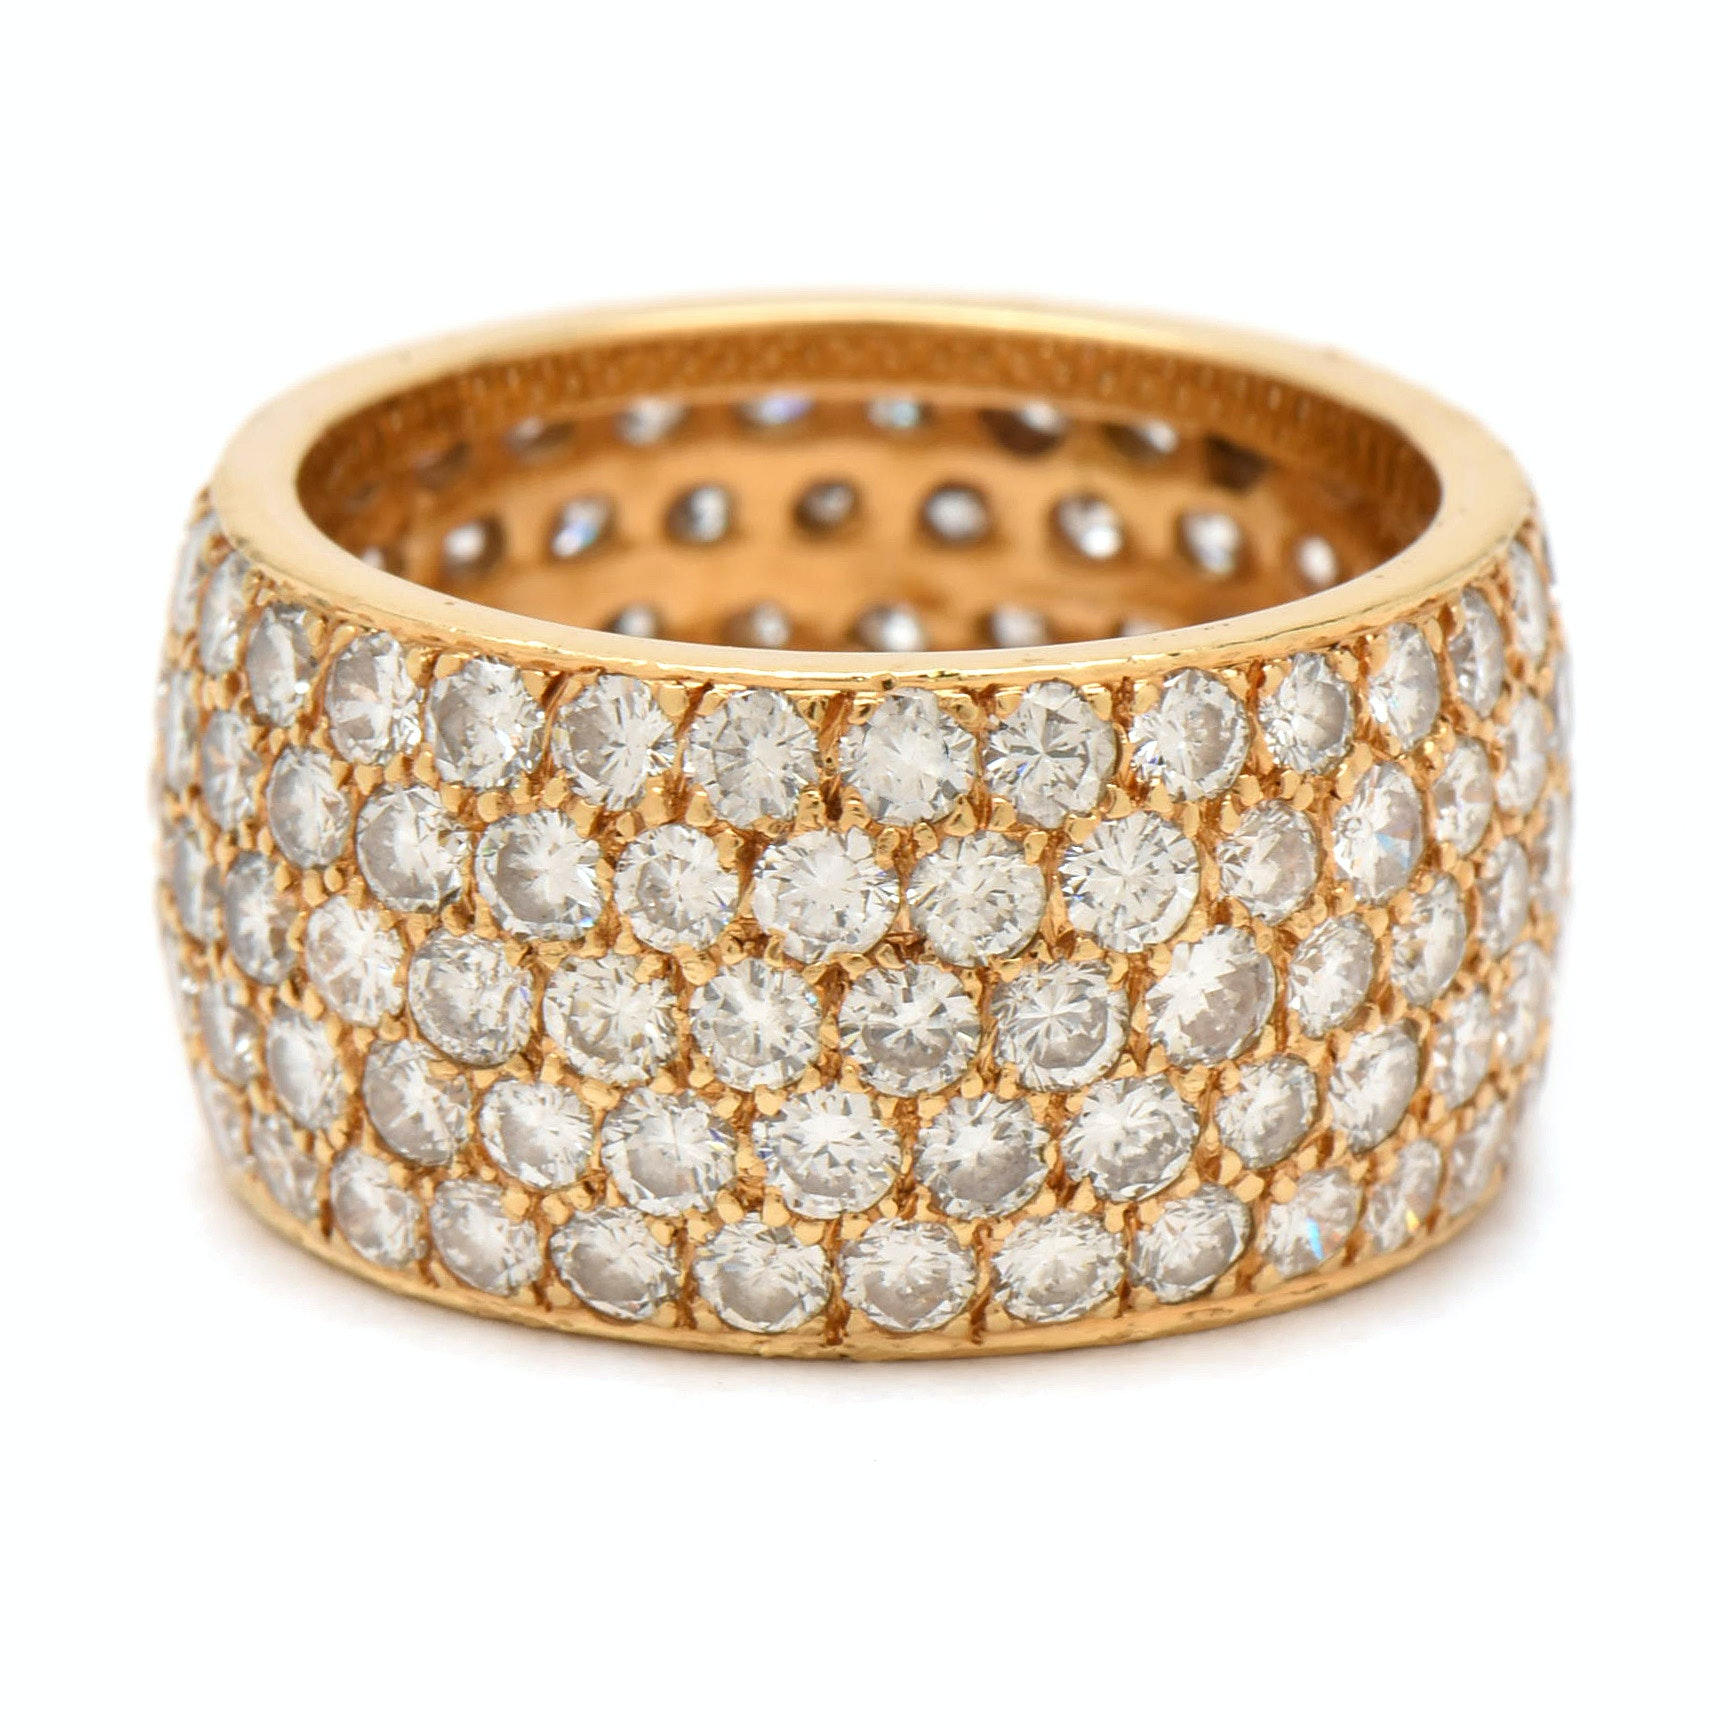 18K Yellow Gold 5.05 CTW Diamond Pavé Set Eternity Band Ring